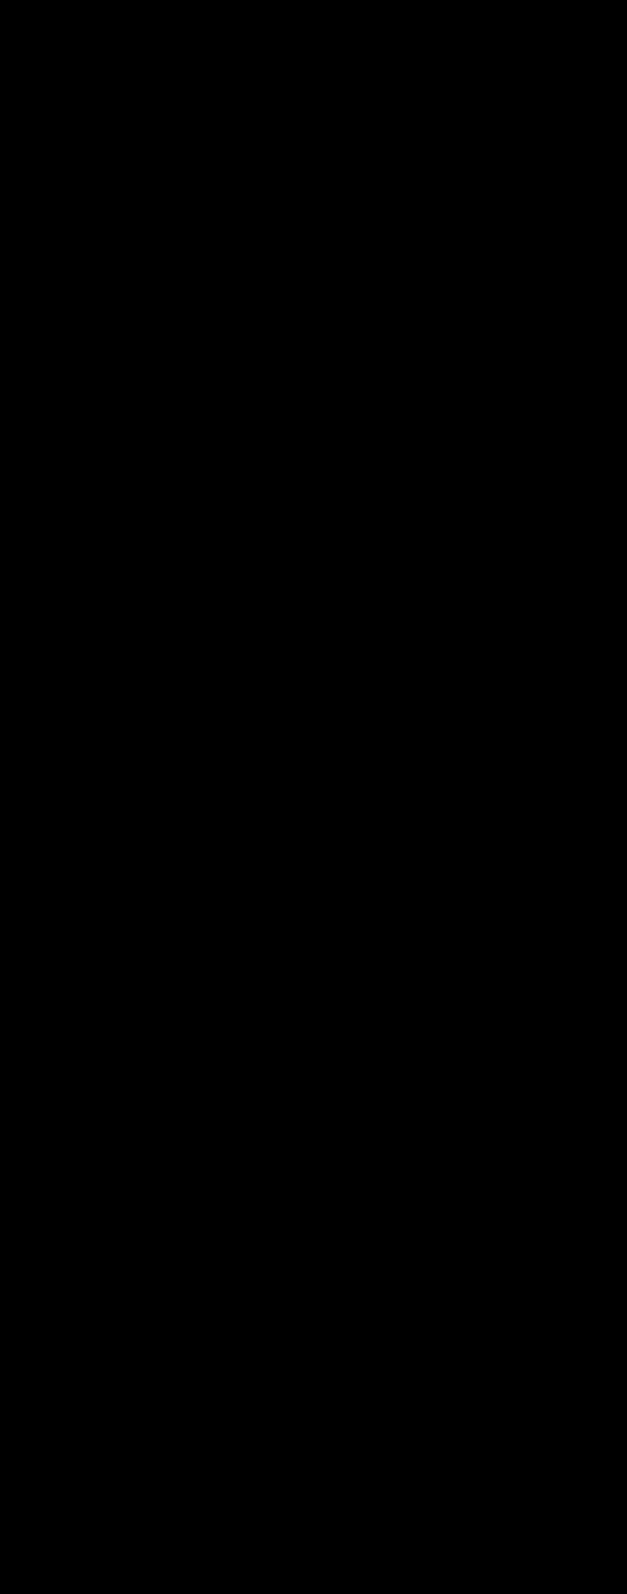 image77.png